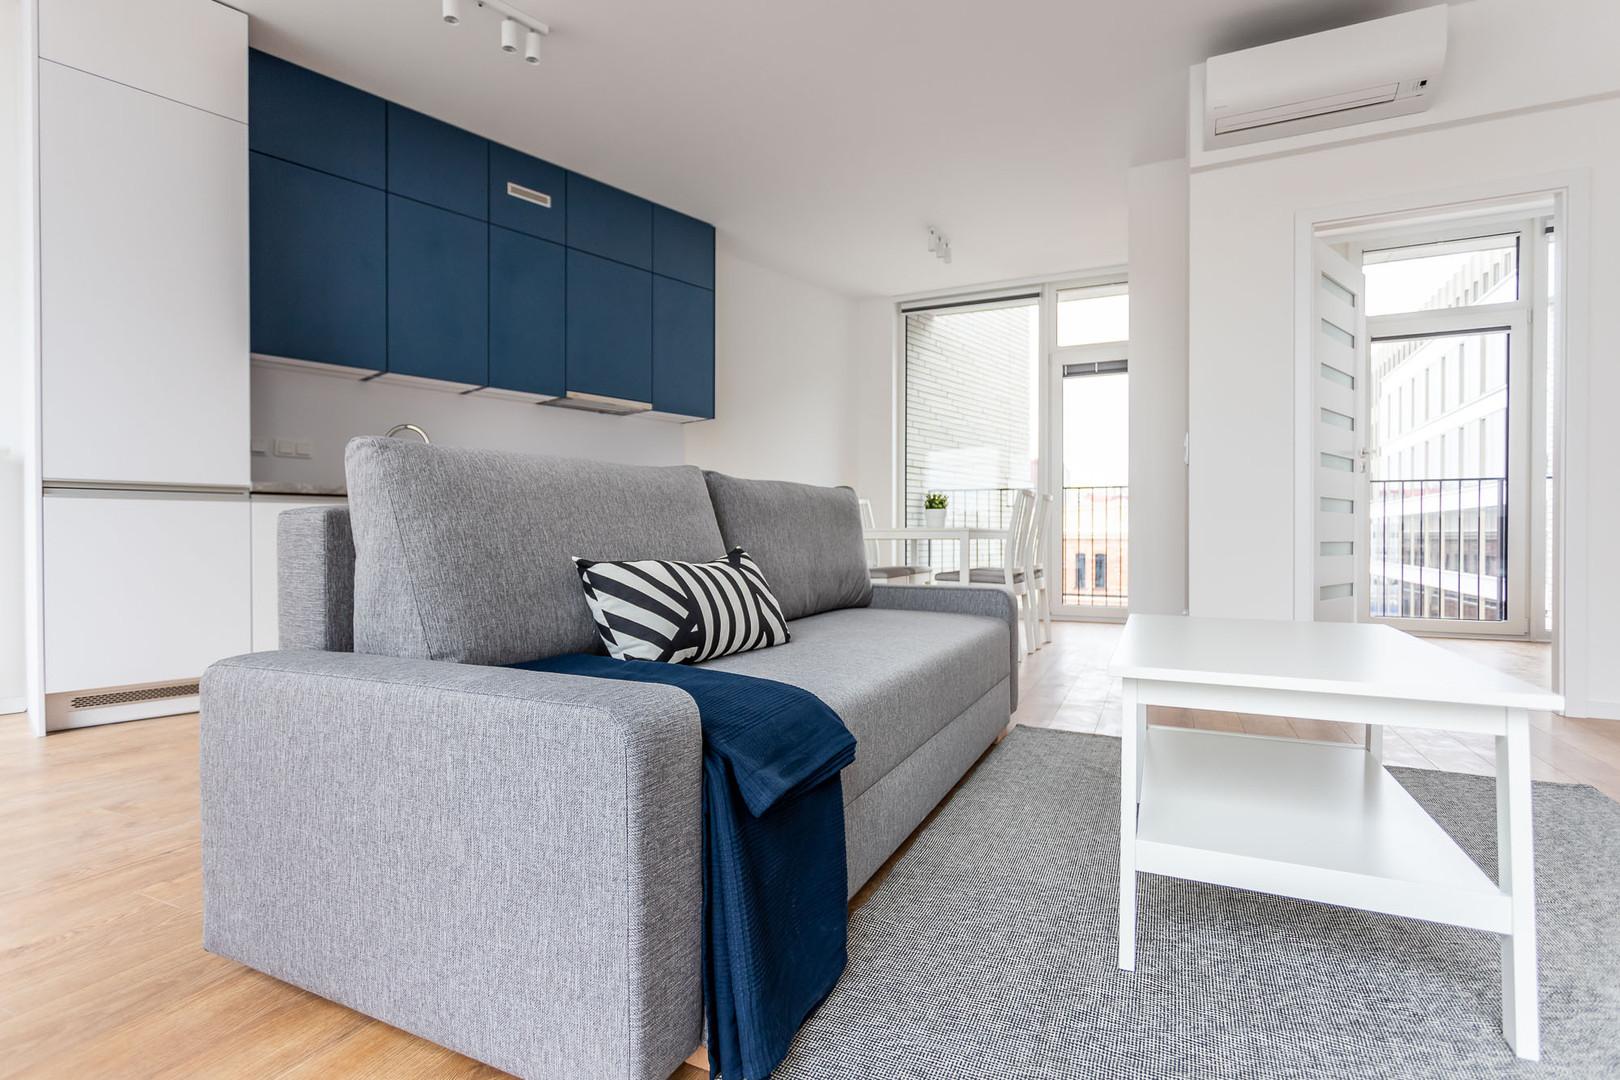 Poznan 2 bedroom apartments for rent-2.j